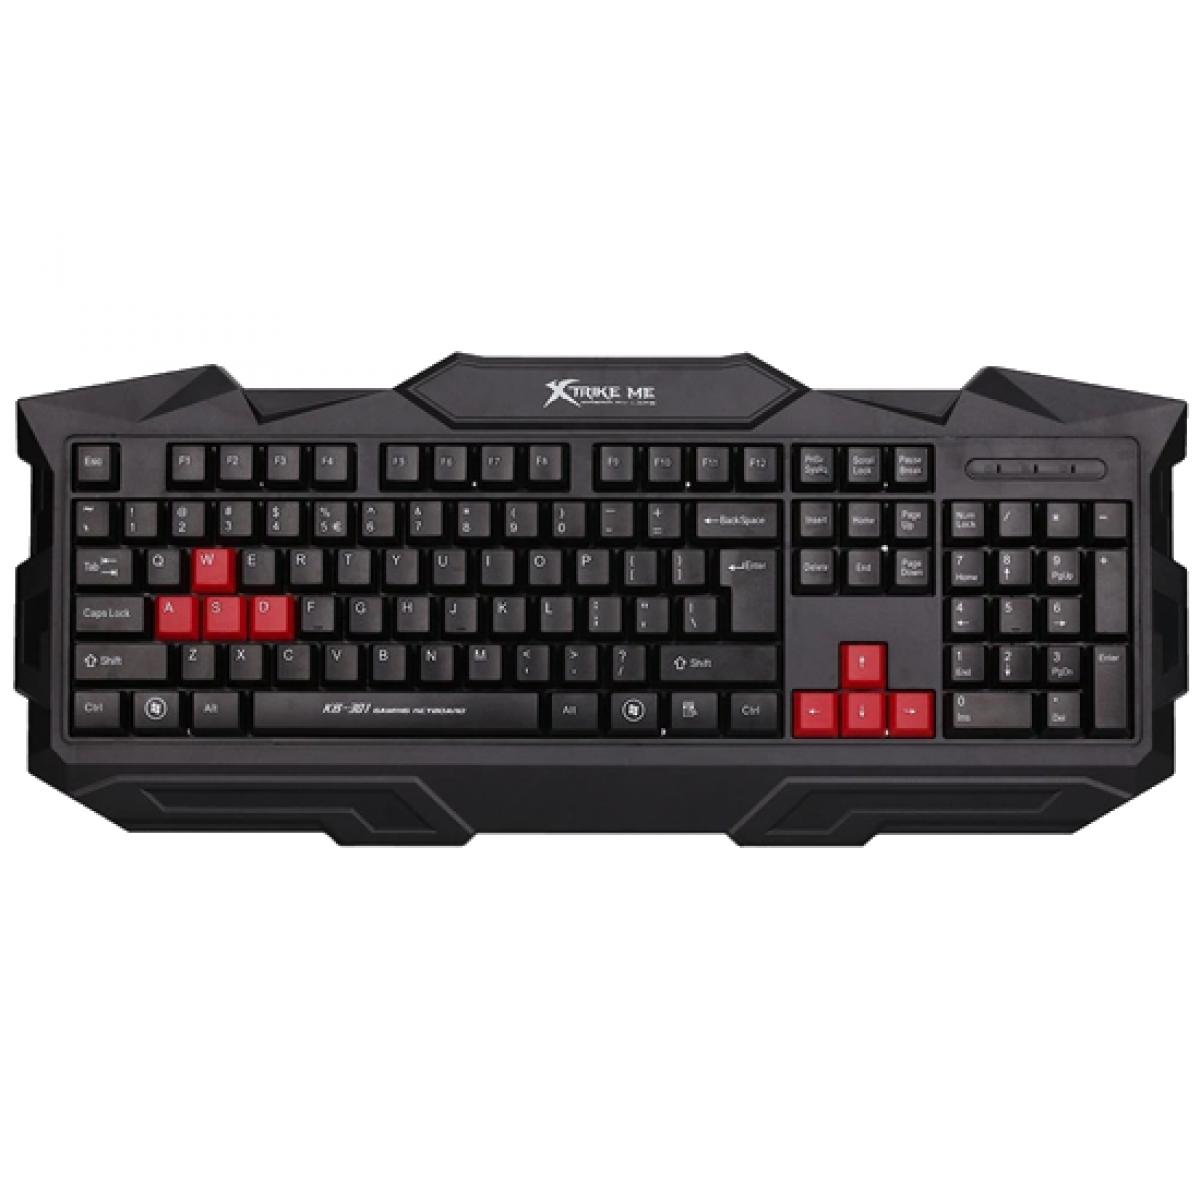 Teclado Membrana XTRIKE-ME KB-301, Inglês, Black/Red, KB301BK